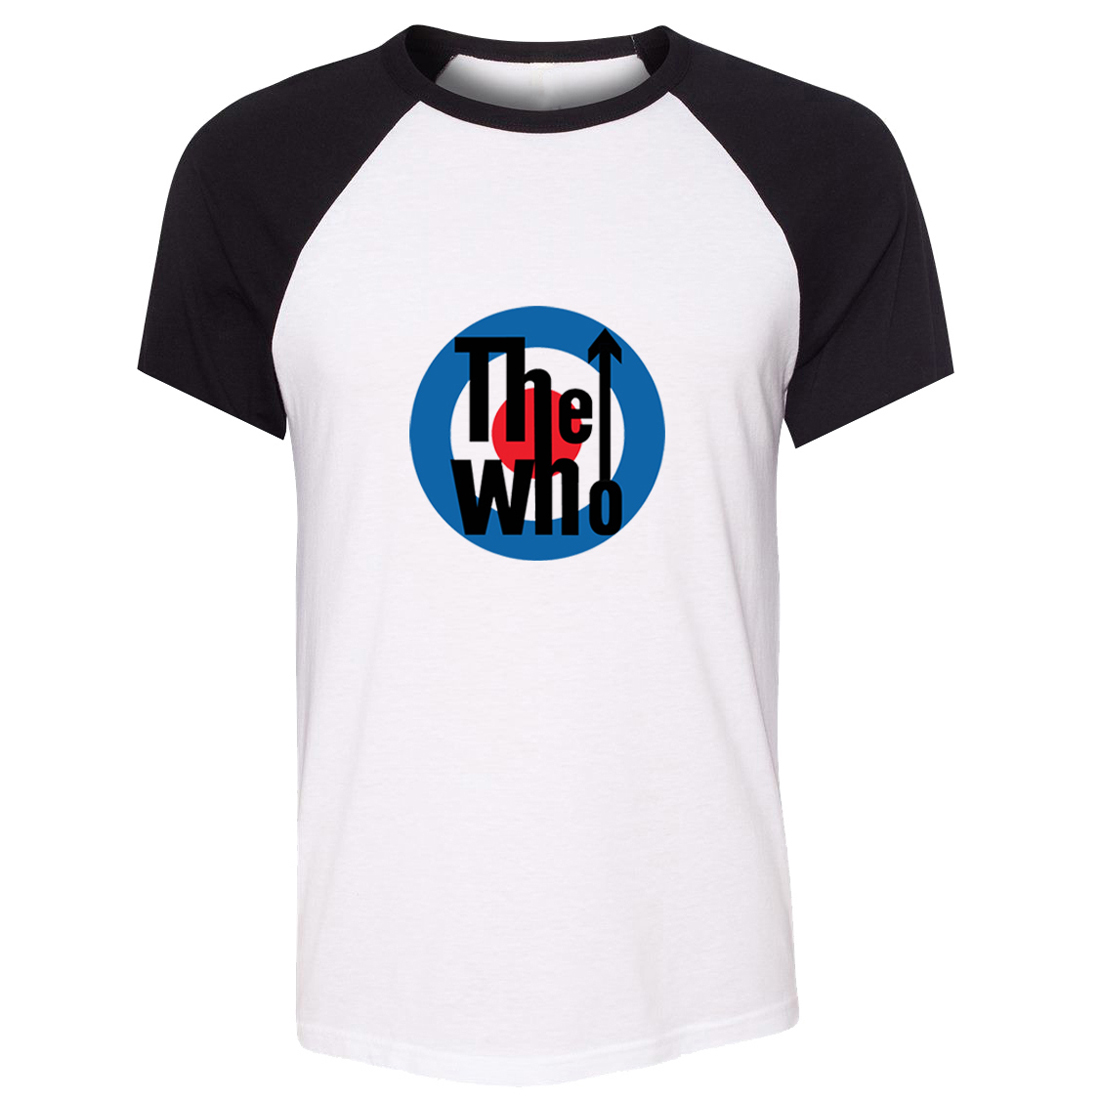 9ee2a96df954c Camiseta unisex el que banda Roger daltrey John Entwistle Keith Moon Pete  Townshend patrón de manga corta hombres camiseta casual camiseta